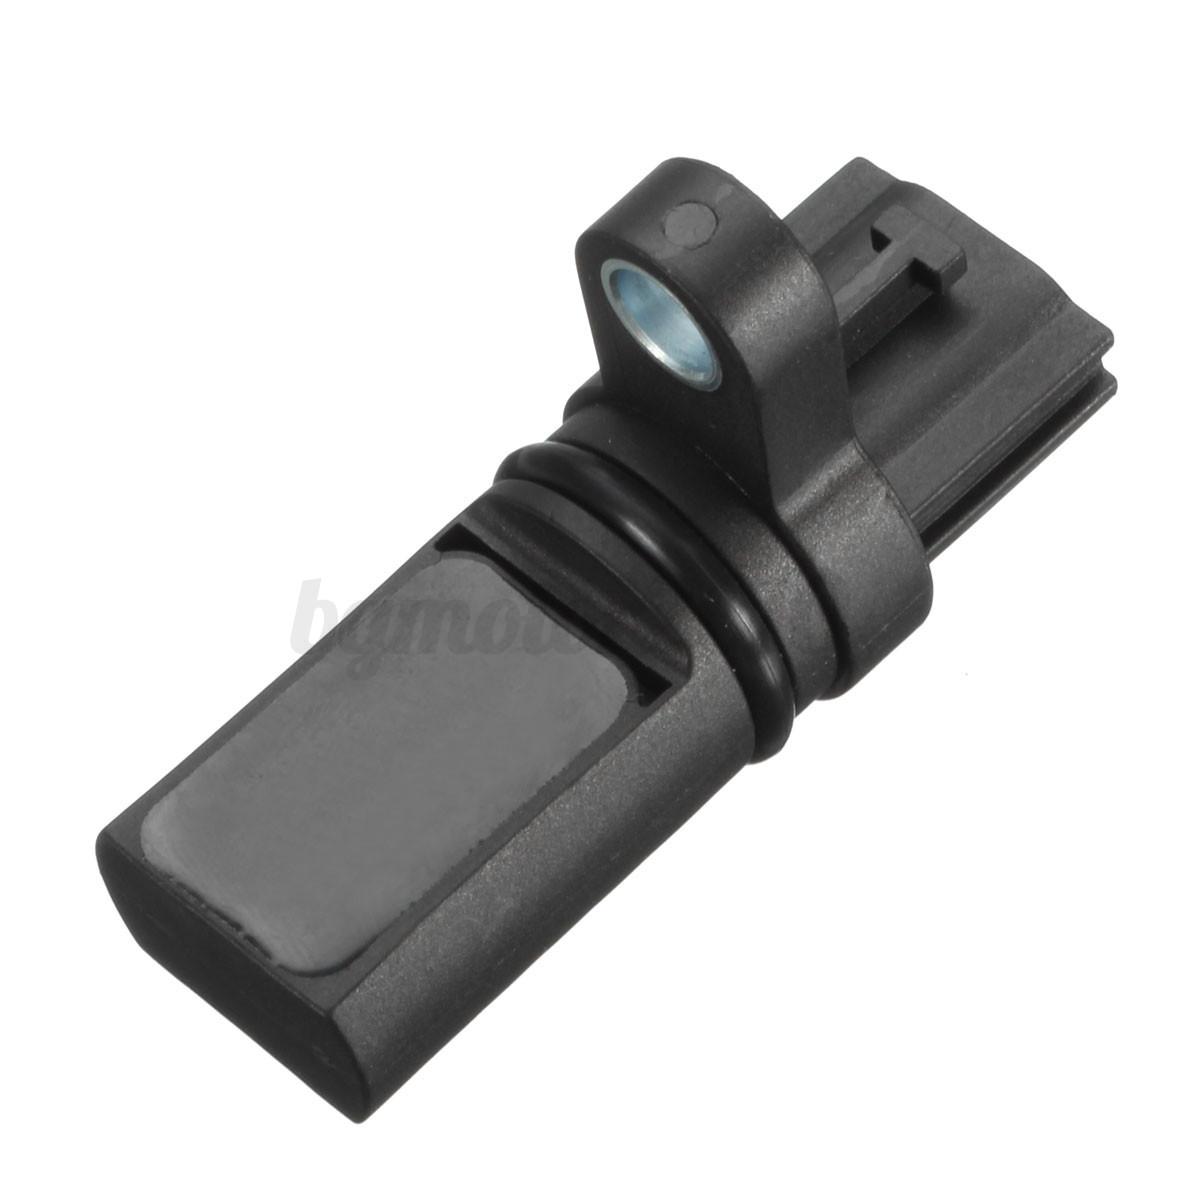 2000 Infiniti Q Camshaft: 3pcs Camshaft Crankshaft Position Sensor Front Left